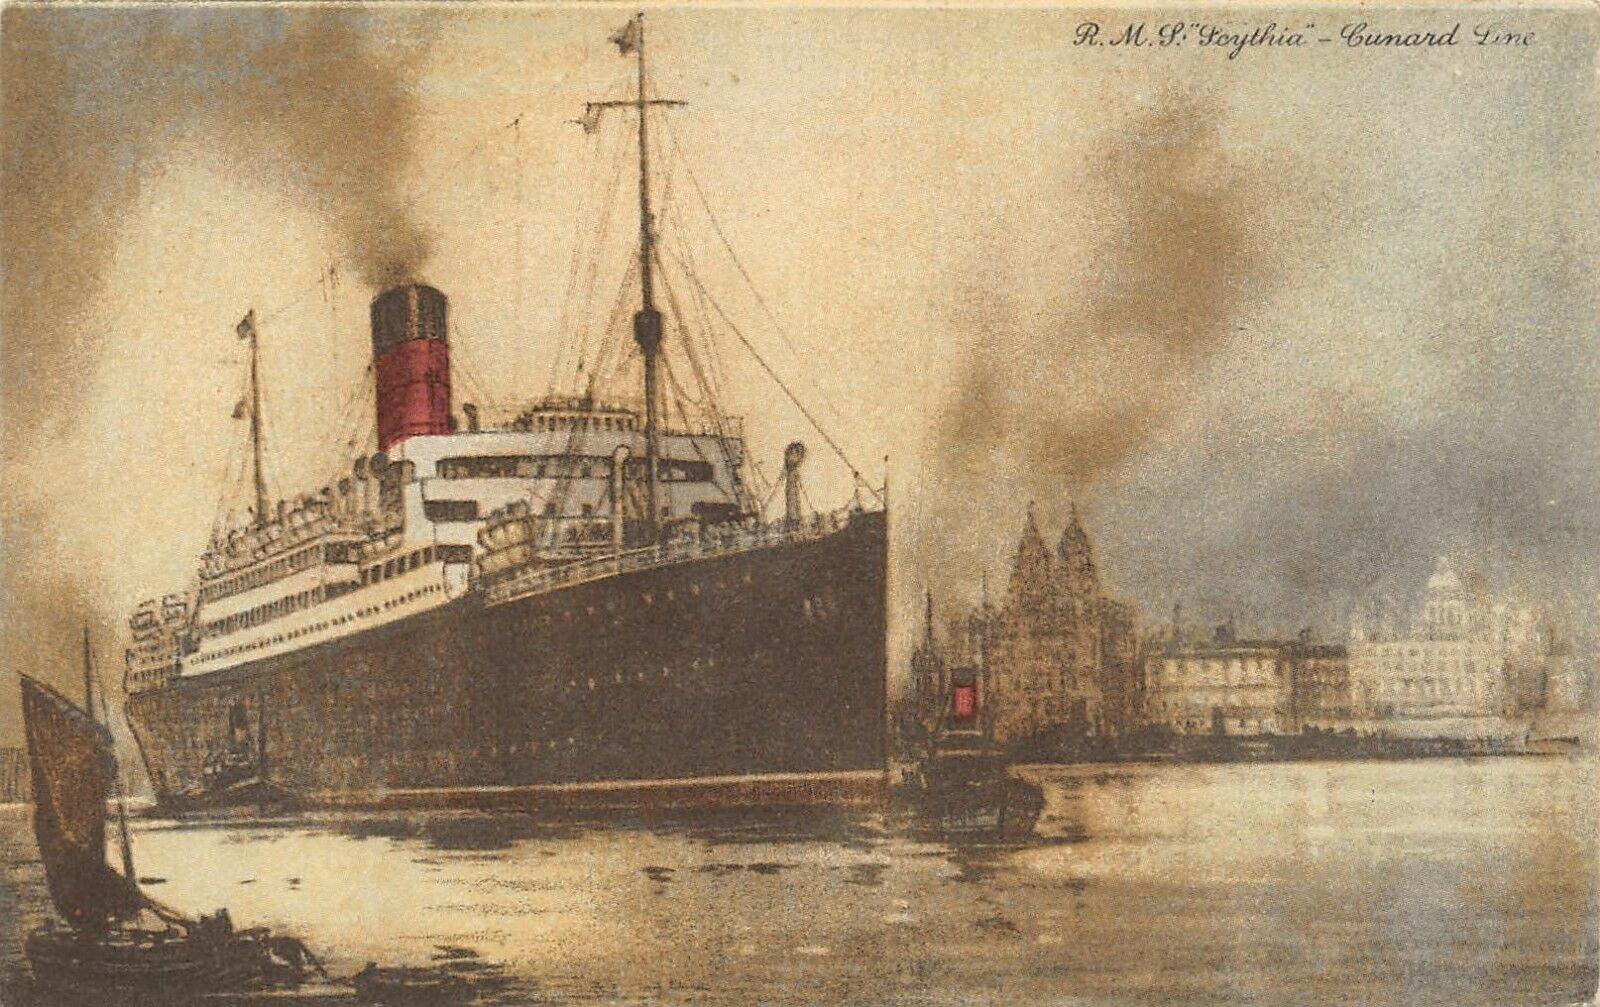 RMS Scythia